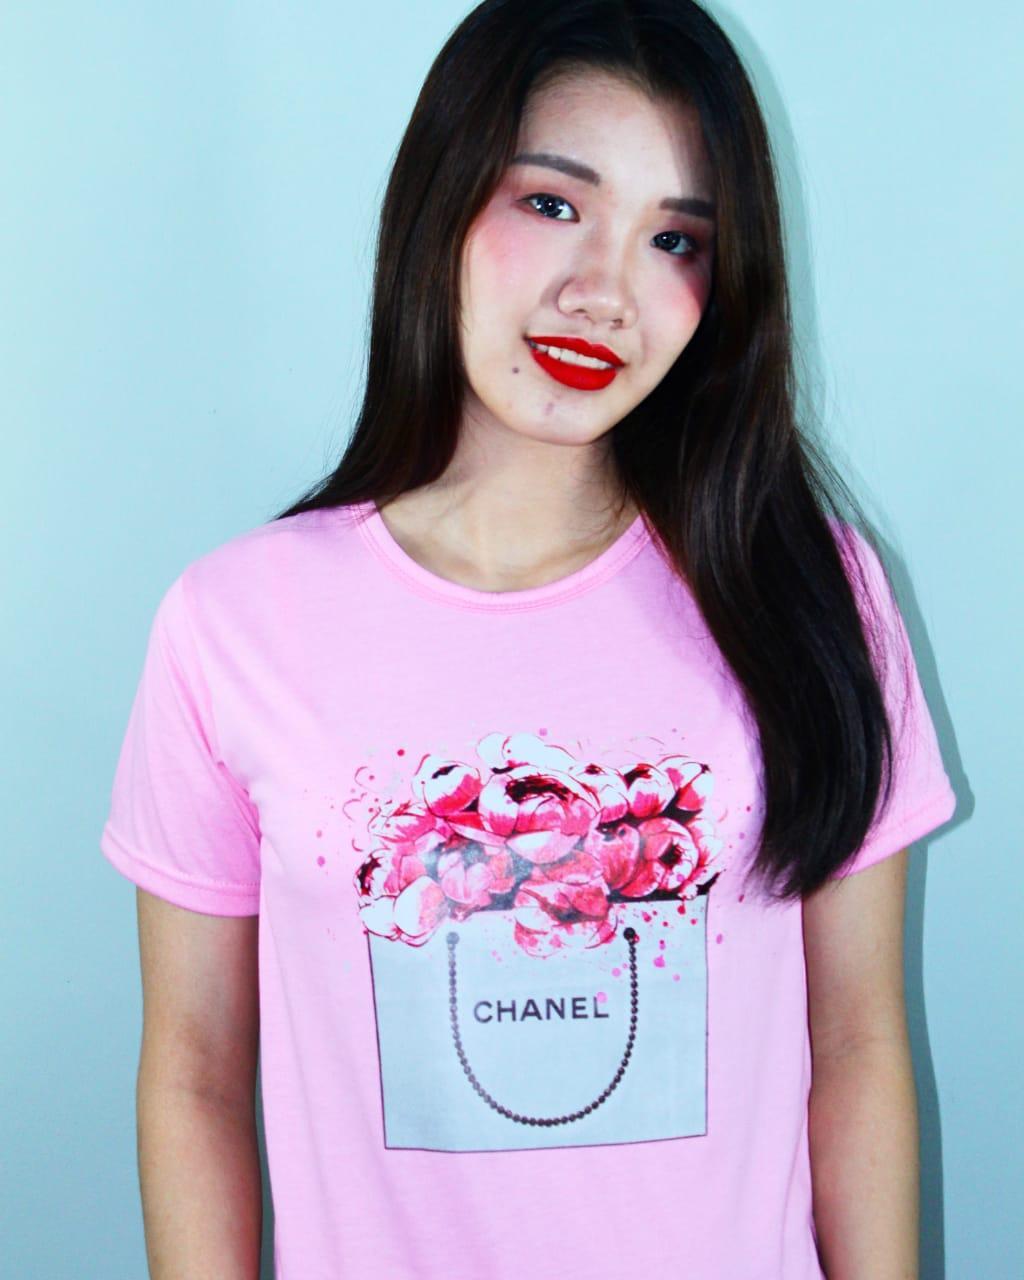 Features Promo Murah Clutch Bag Chanel Dan Harga Terbaru - Katalog ... f382f0a915